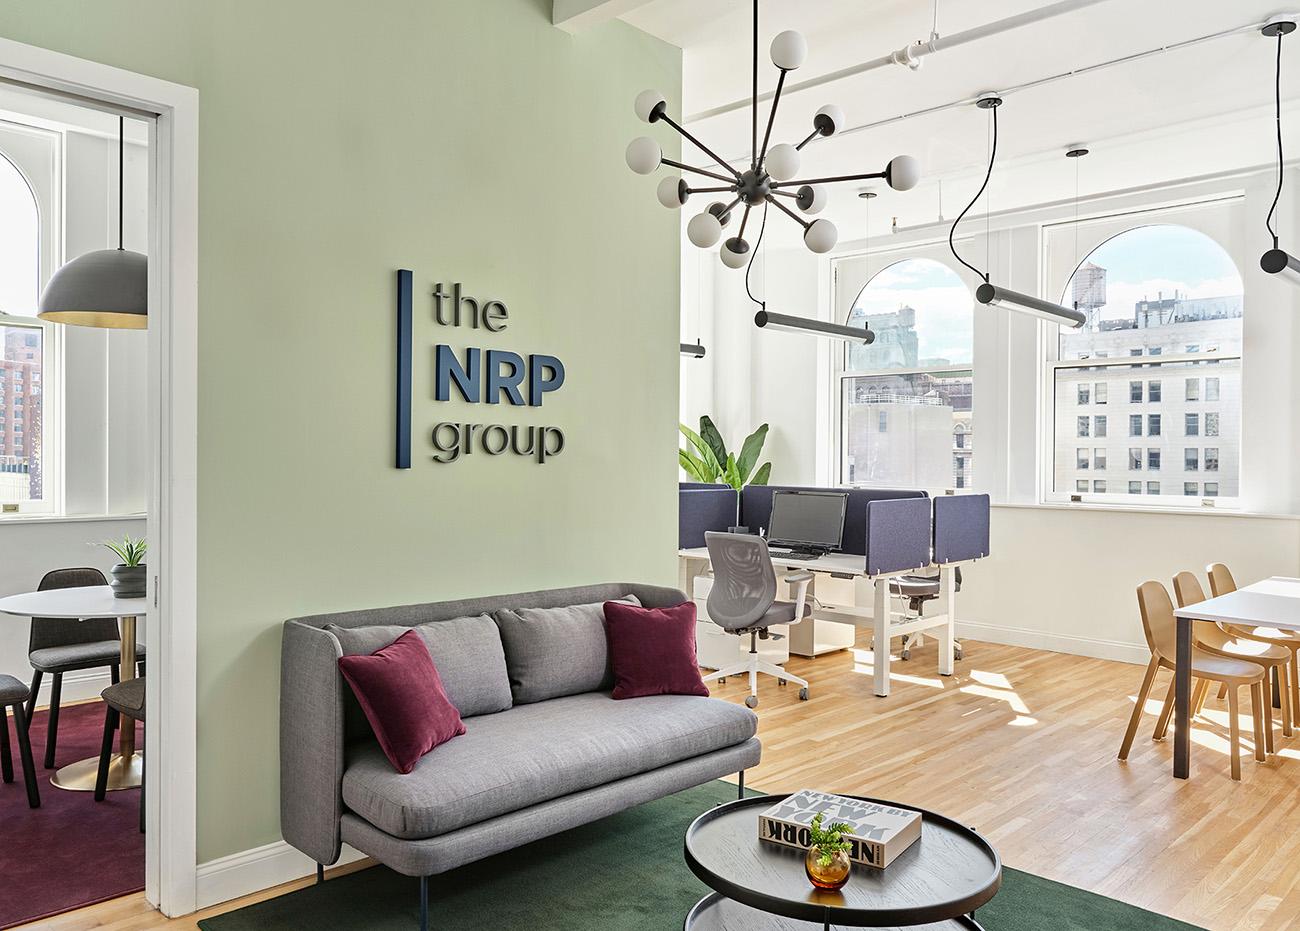 A Peek Inside NRP Group's Minimalist NYC Office